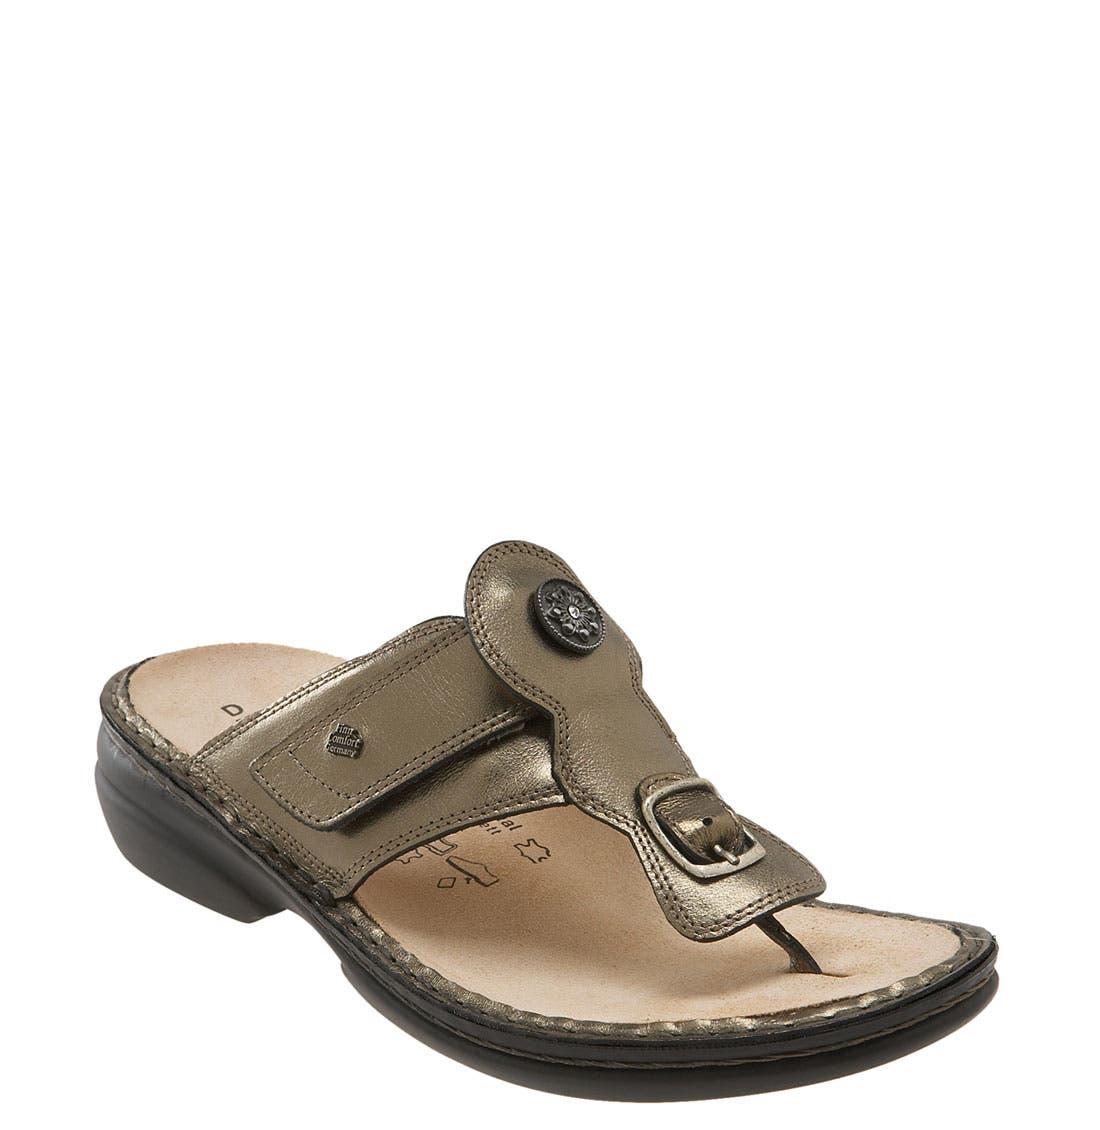 Main Image - Finn Comfort 'Wichita' Sandal